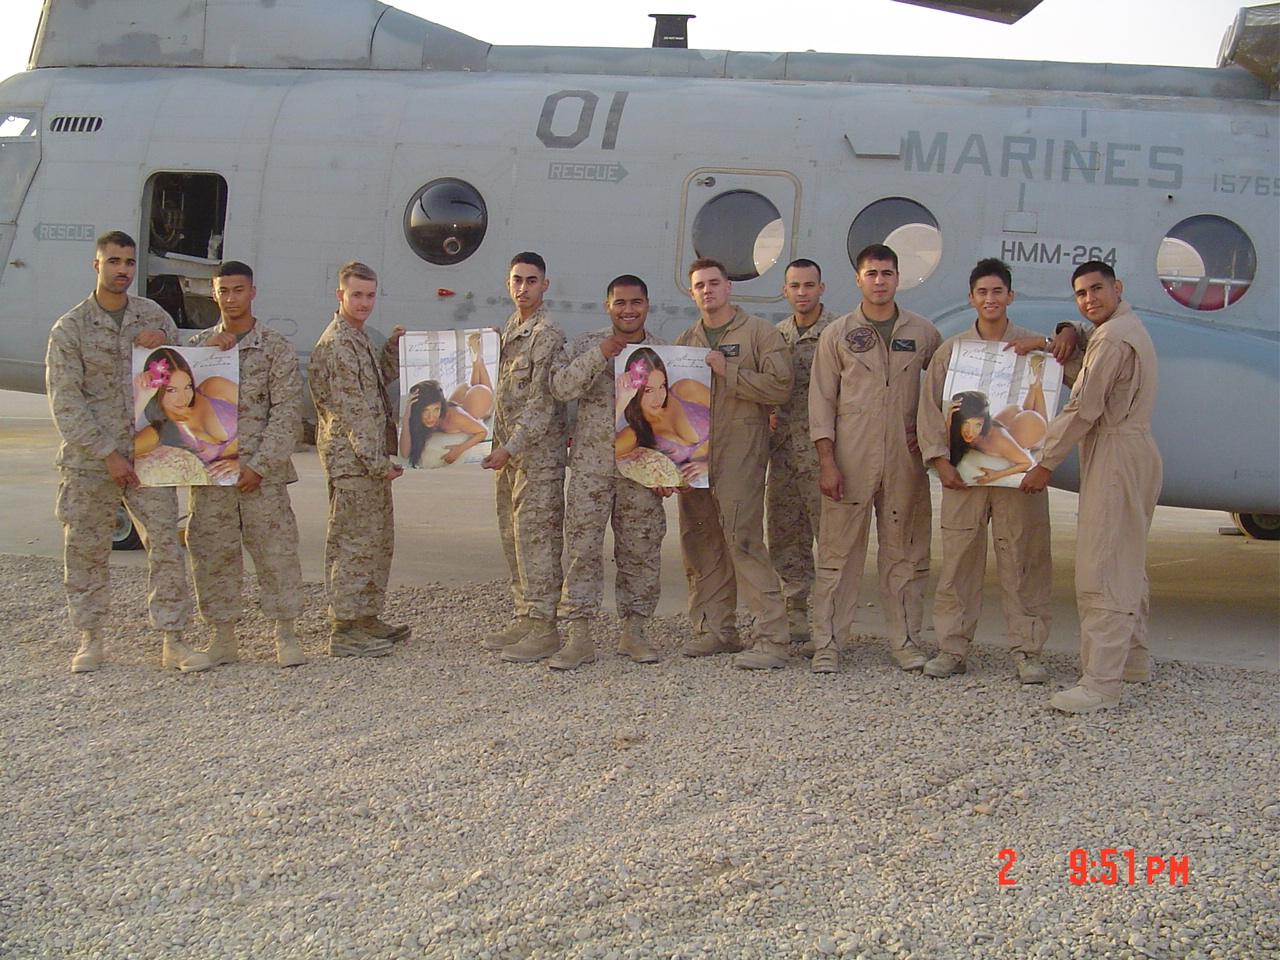 Hot sexy marines